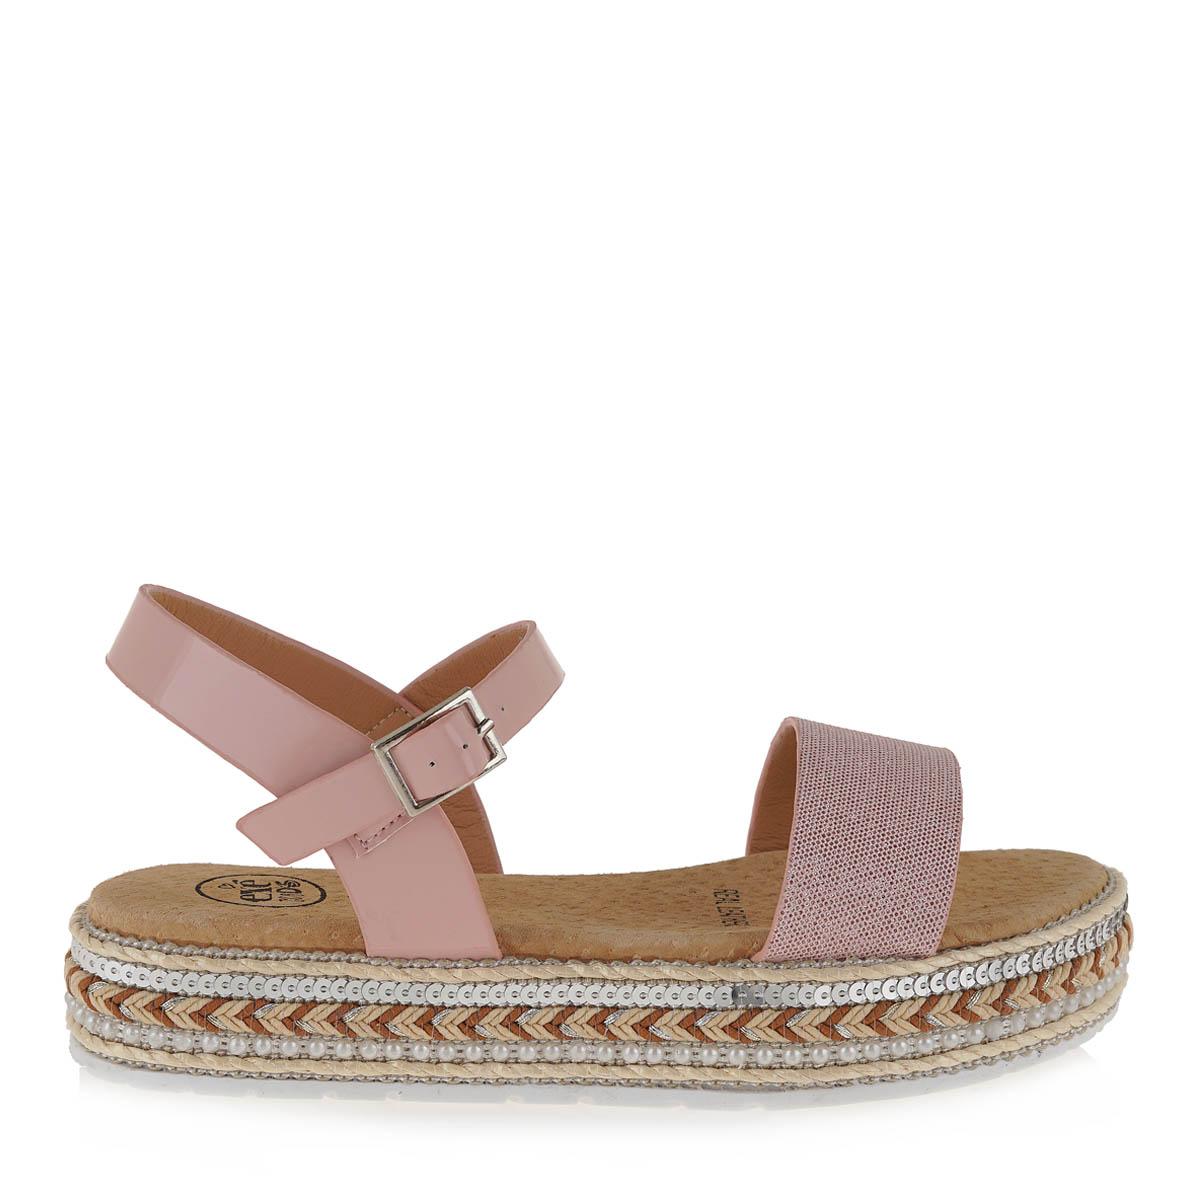 89128e9c446 ΠΕΔΙΛΑ σχέδιο: IA21U6012 - Roe Shoes Collection